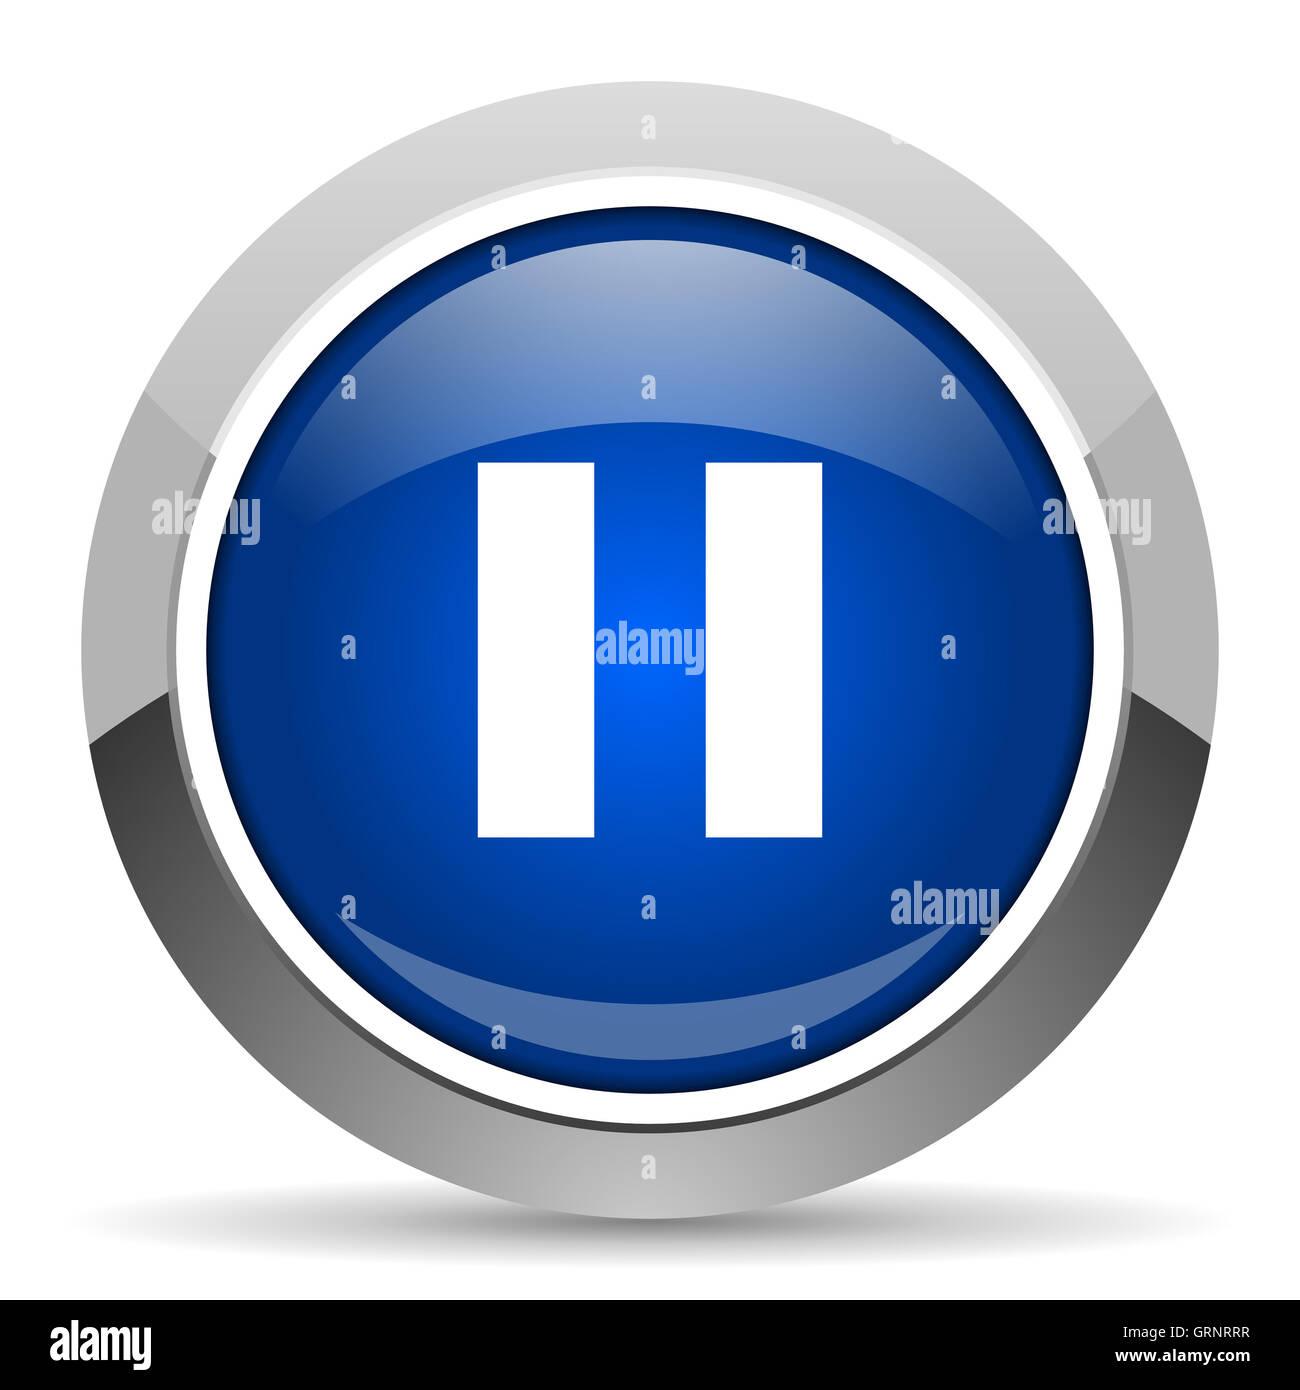 pause icon - Stock Image